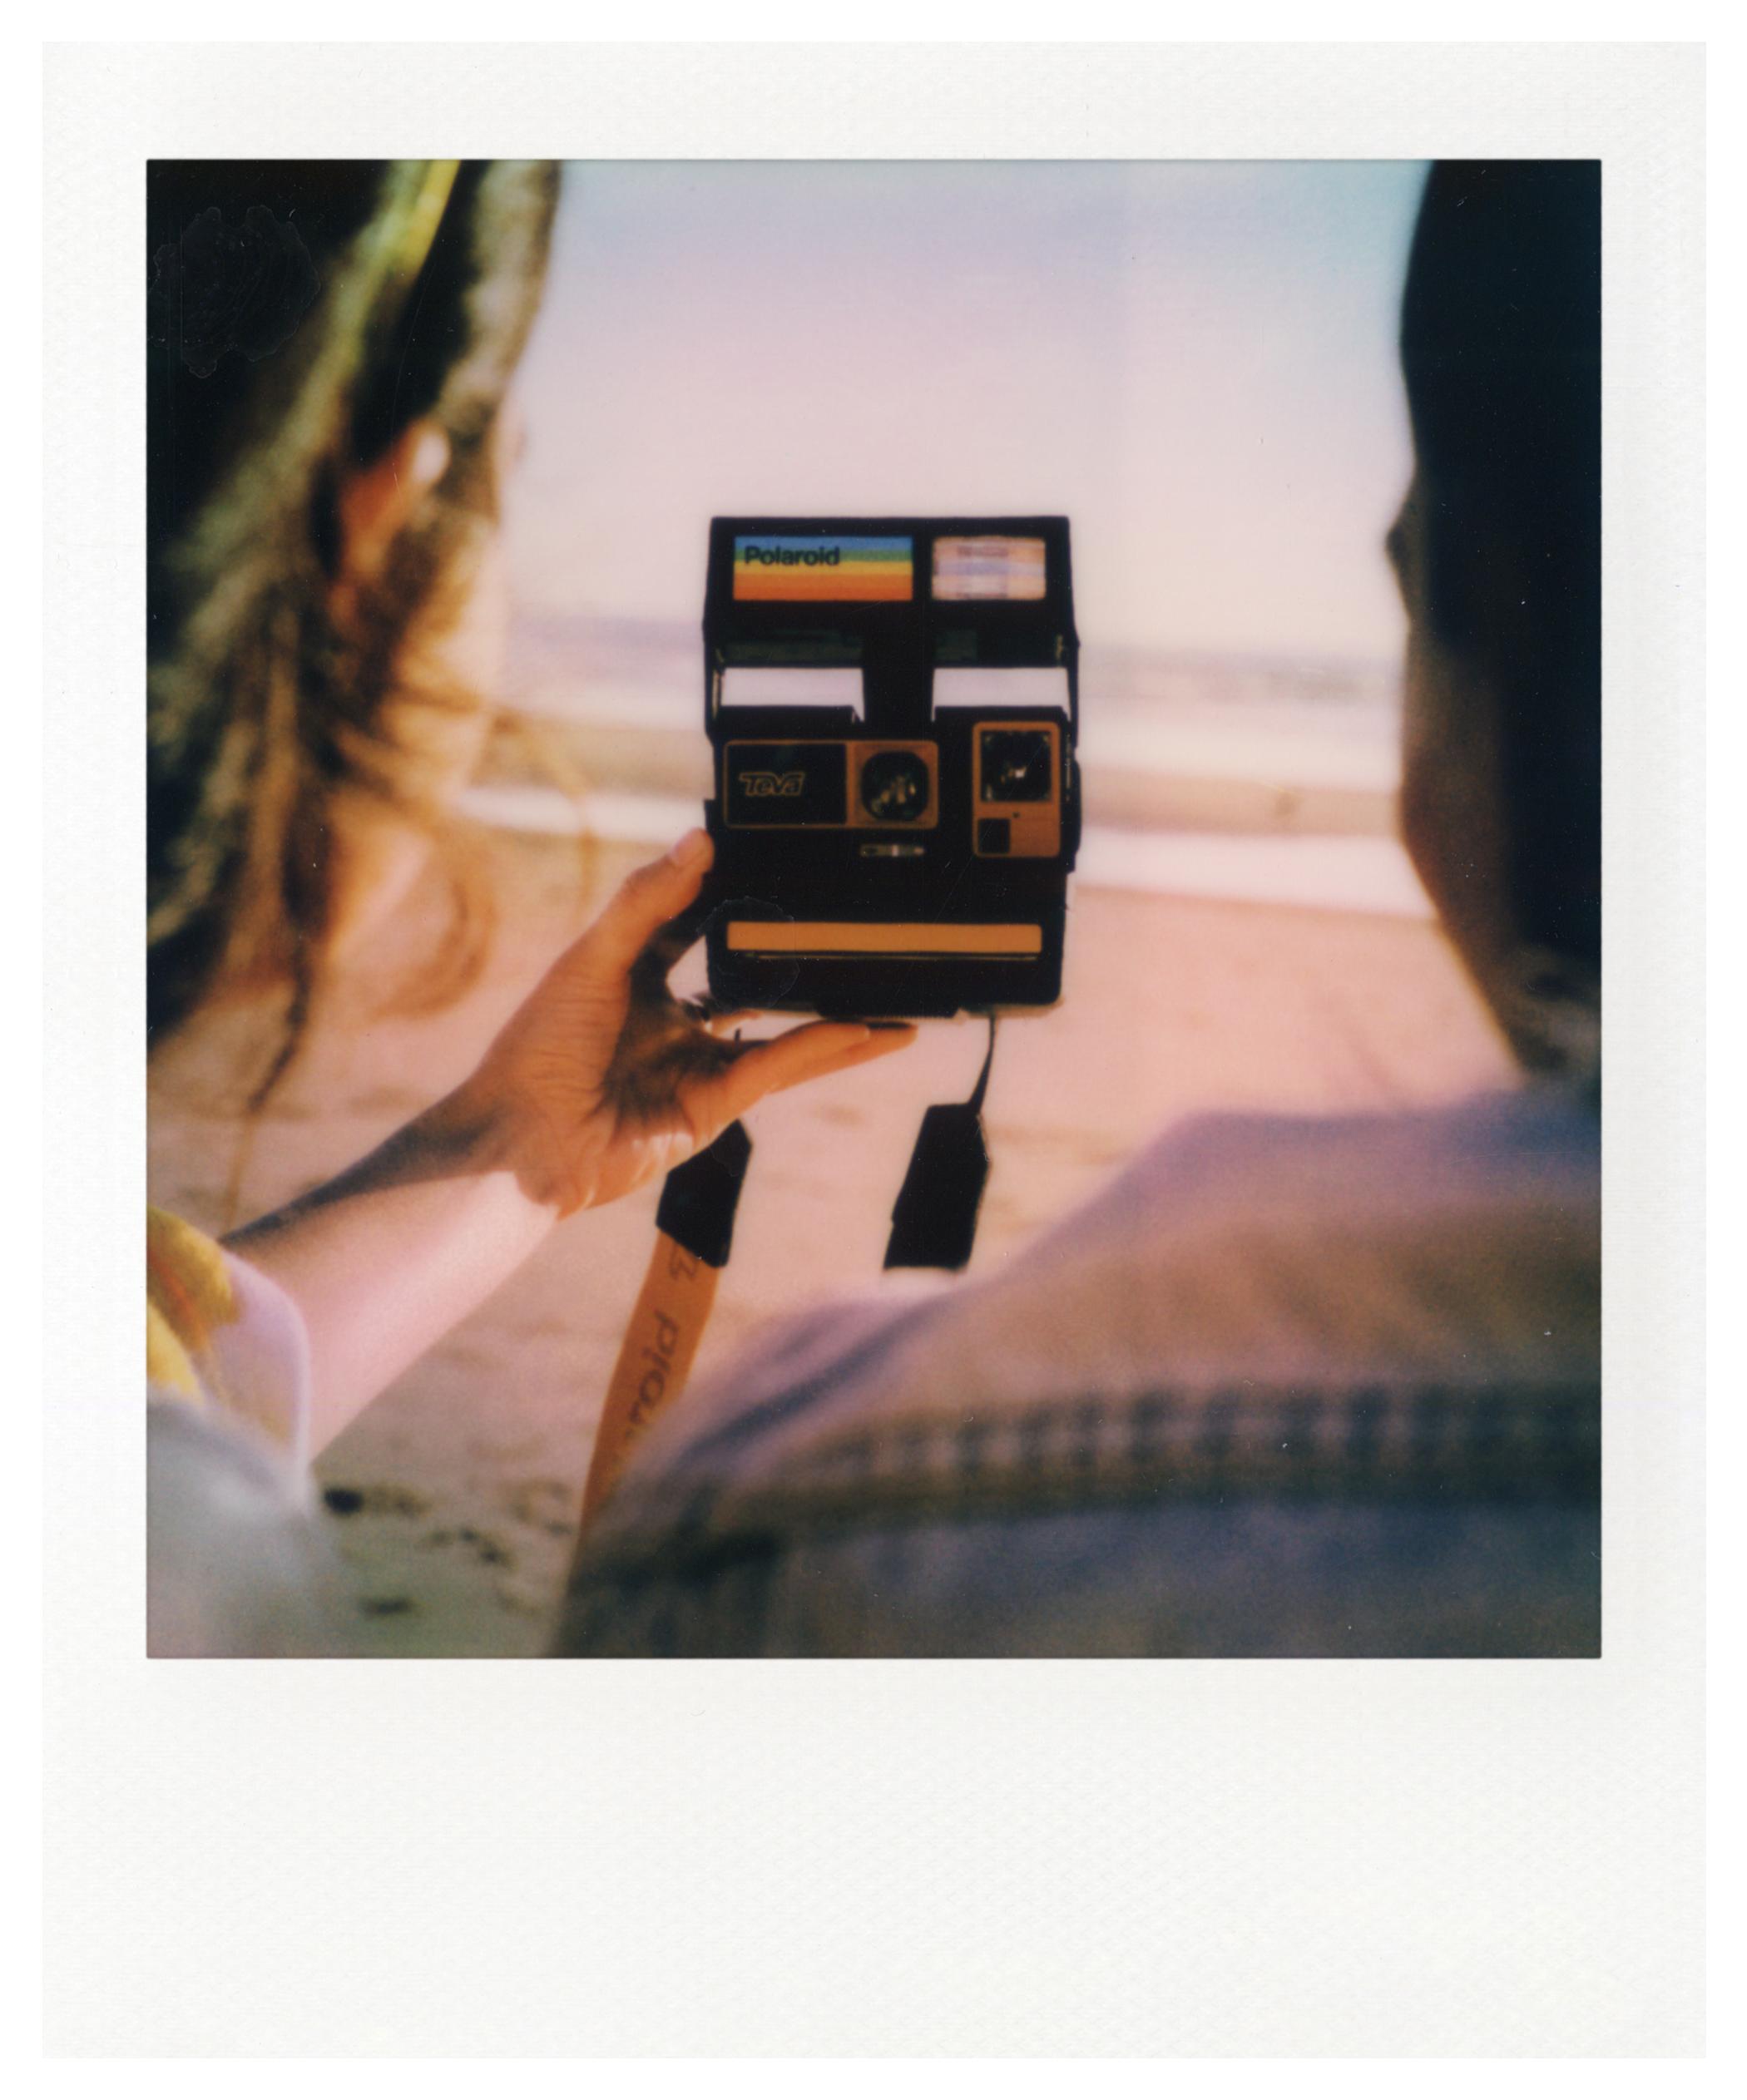 STYLECASTER |  Teva x Polaroid